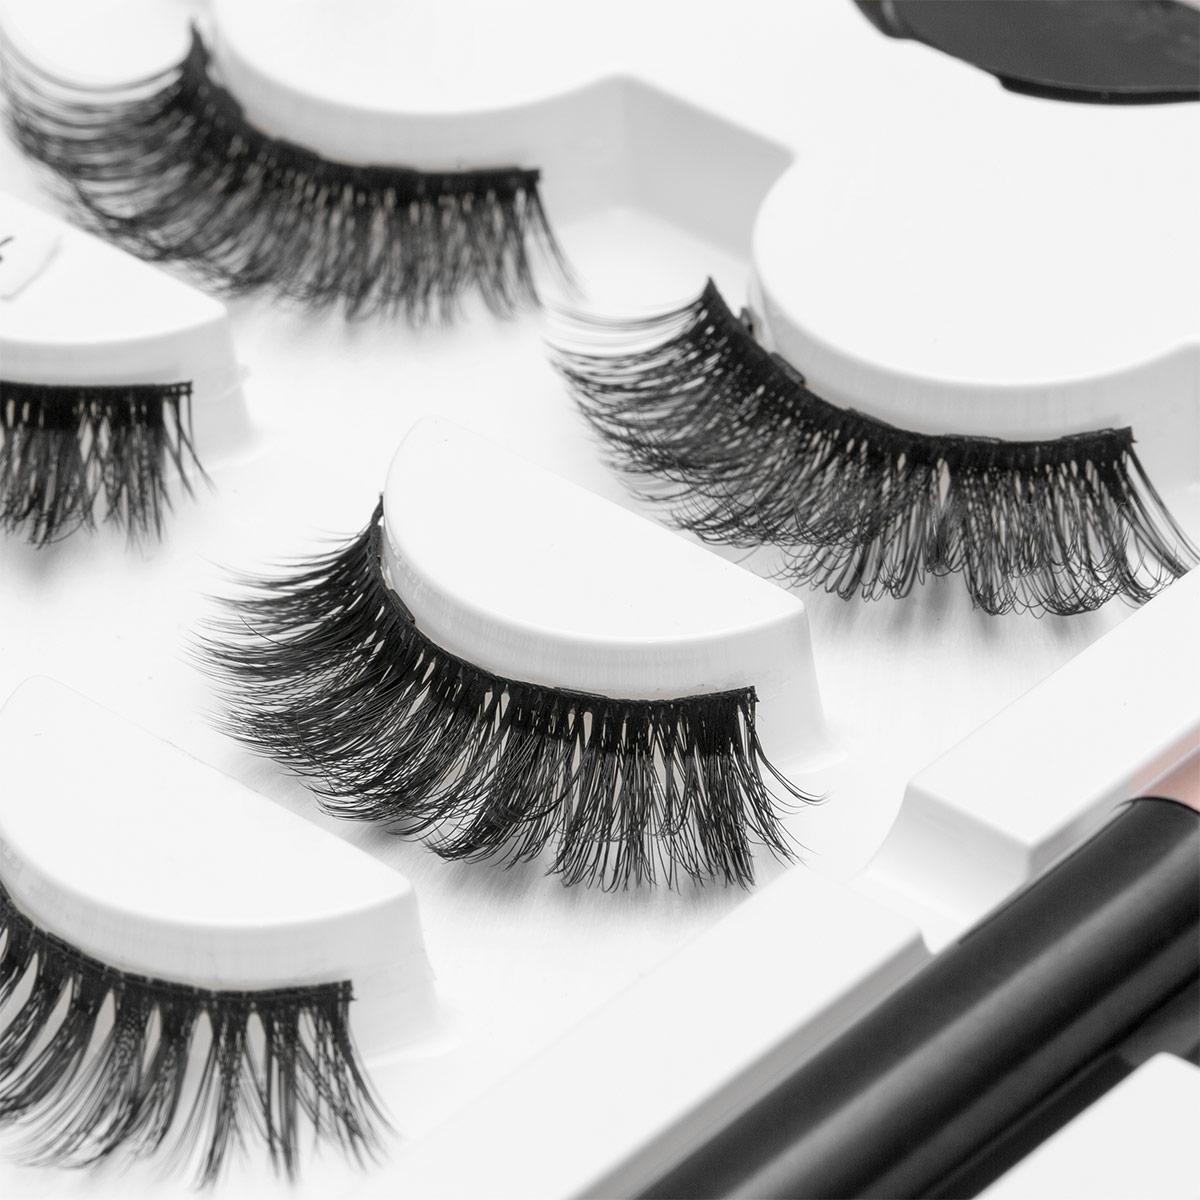 Image 4 - SEXYSHEEP Magnetic Eyelashes Eyeliner Eyelash Curler Set5 Magnet Natural Long Magnetic False Eyelashes With Magnetic Eyeliner-in Eyelashes Set from Beauty & Health